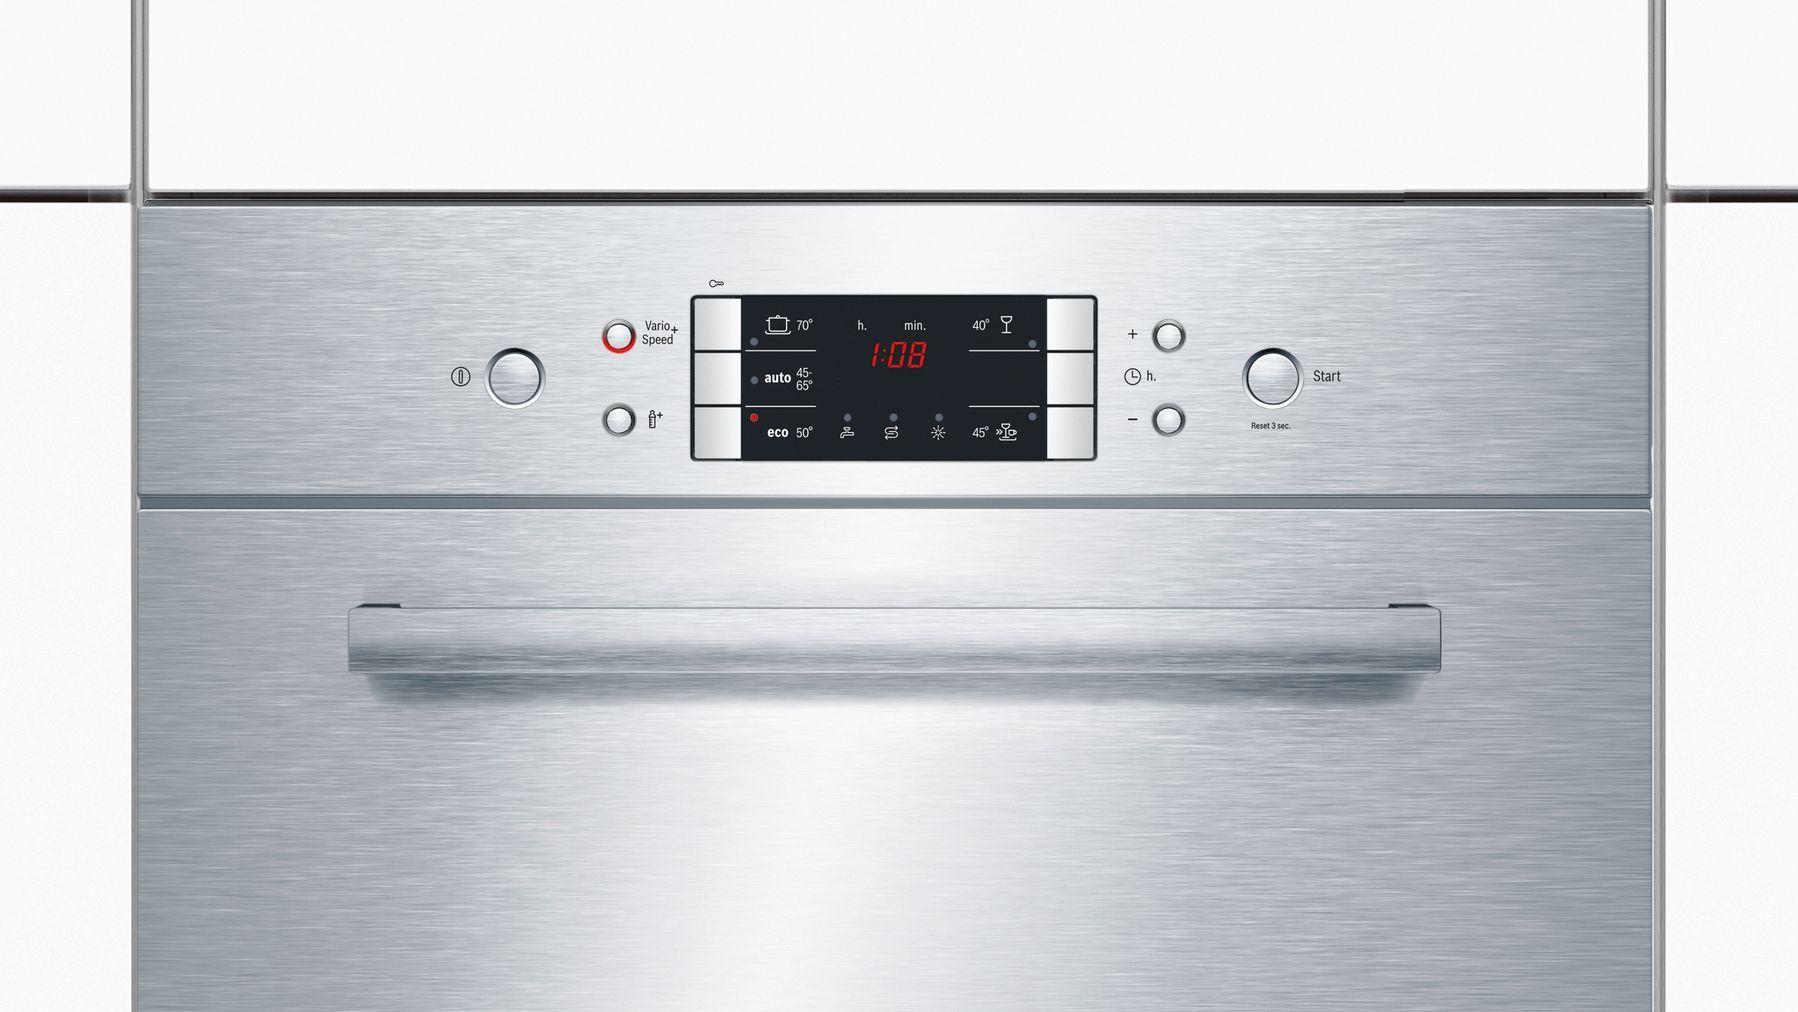 Máy Rửa Bát Bosch SCE52M65EU, máy rửa bát Bosch, máy rửa bát giá rẻ Hà Nội, máy rửa chén giá rẻ tại TPHCM, máy rửa bát, may rua bat, máy rửa chén, máy rửa bát giá rẻ,may rua bat gia re, máy rửa bát lắp âm tủ, máy rửa bát nhập khẩu